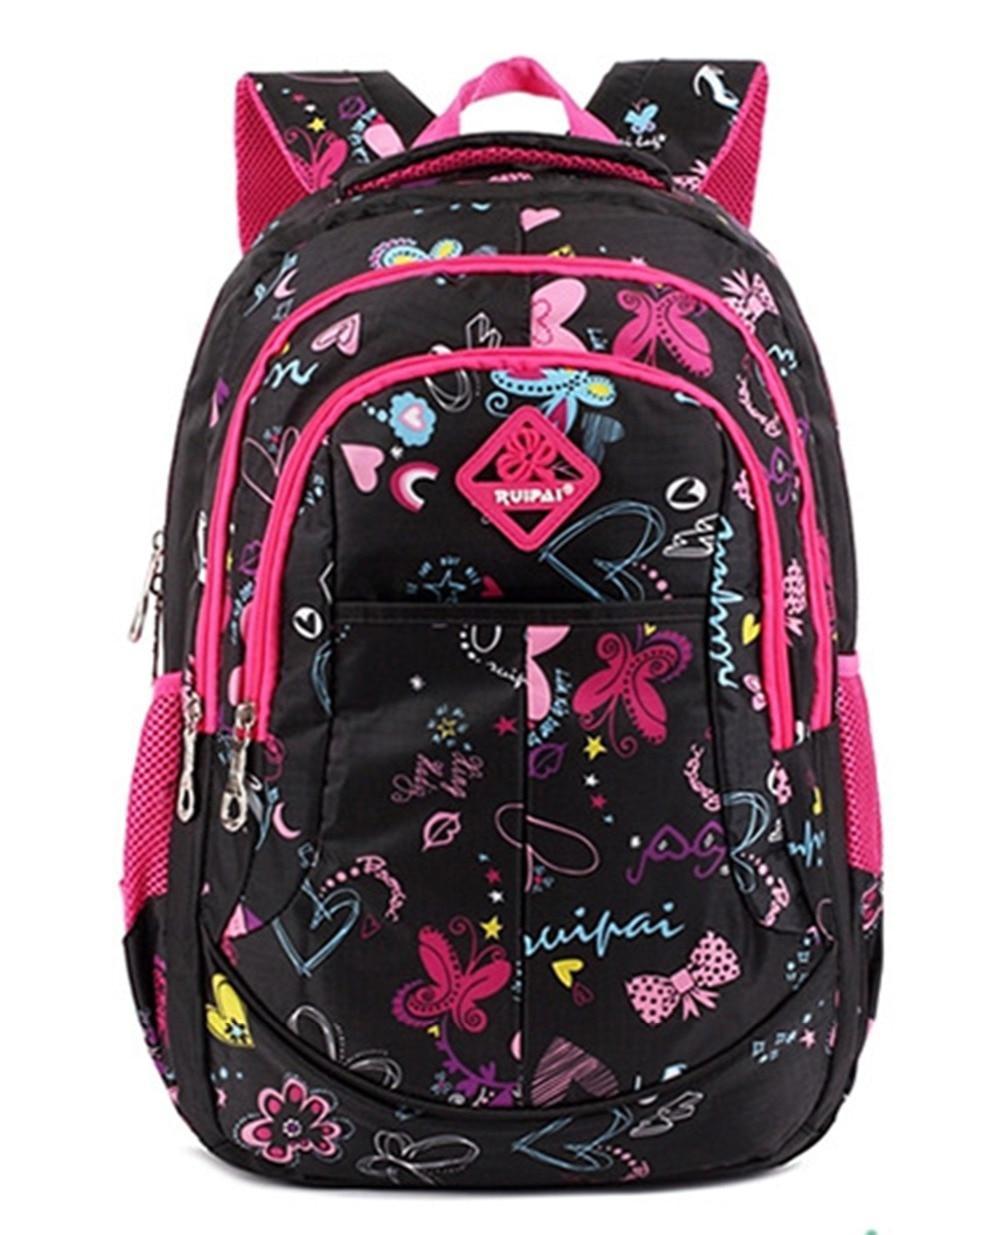 school bag,child backpack,backpack,bags,school backpacks,schoolbag,leather bags,lovely children backpack